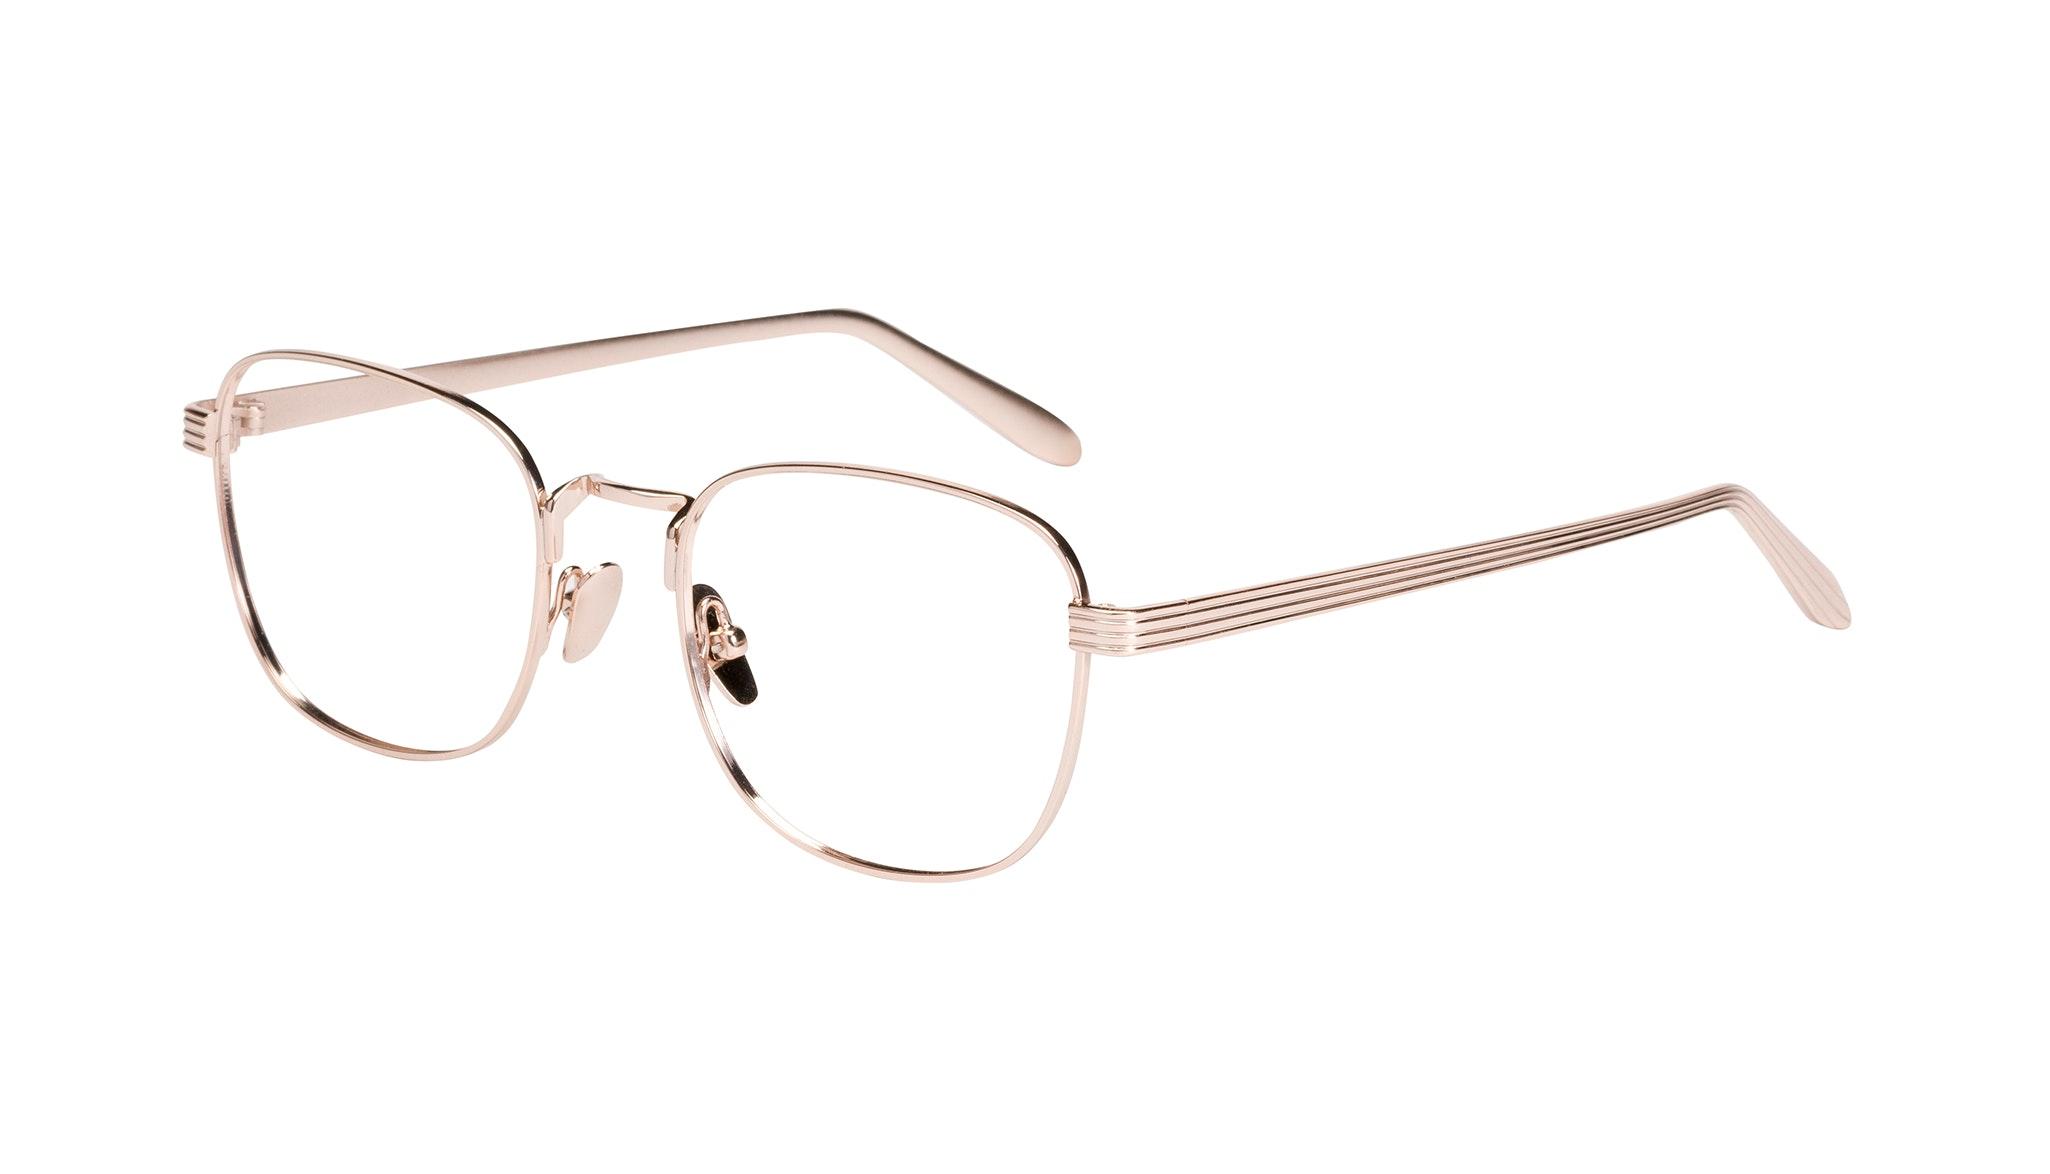 Affordable Fashion Glasses Rectangle Eyeglasses Women Delight Gold Tilt